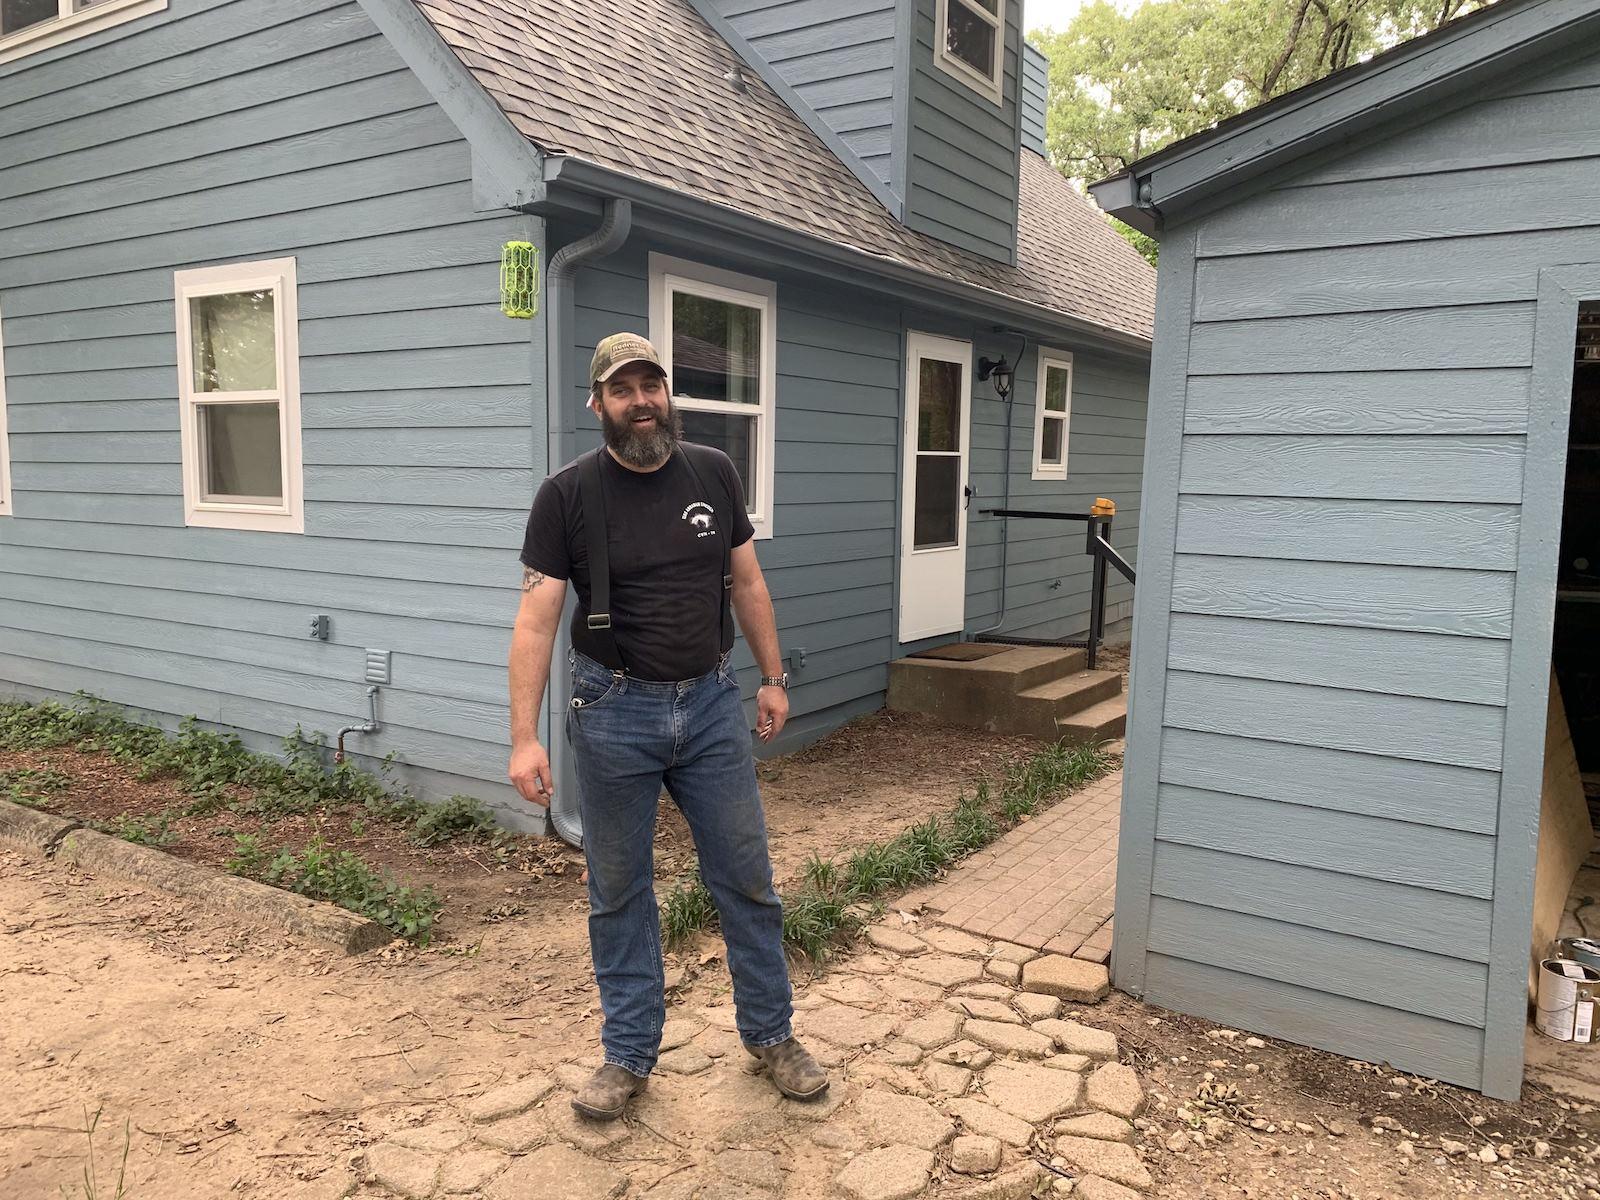 Choice One Restorations team member on Sulphur Springs job